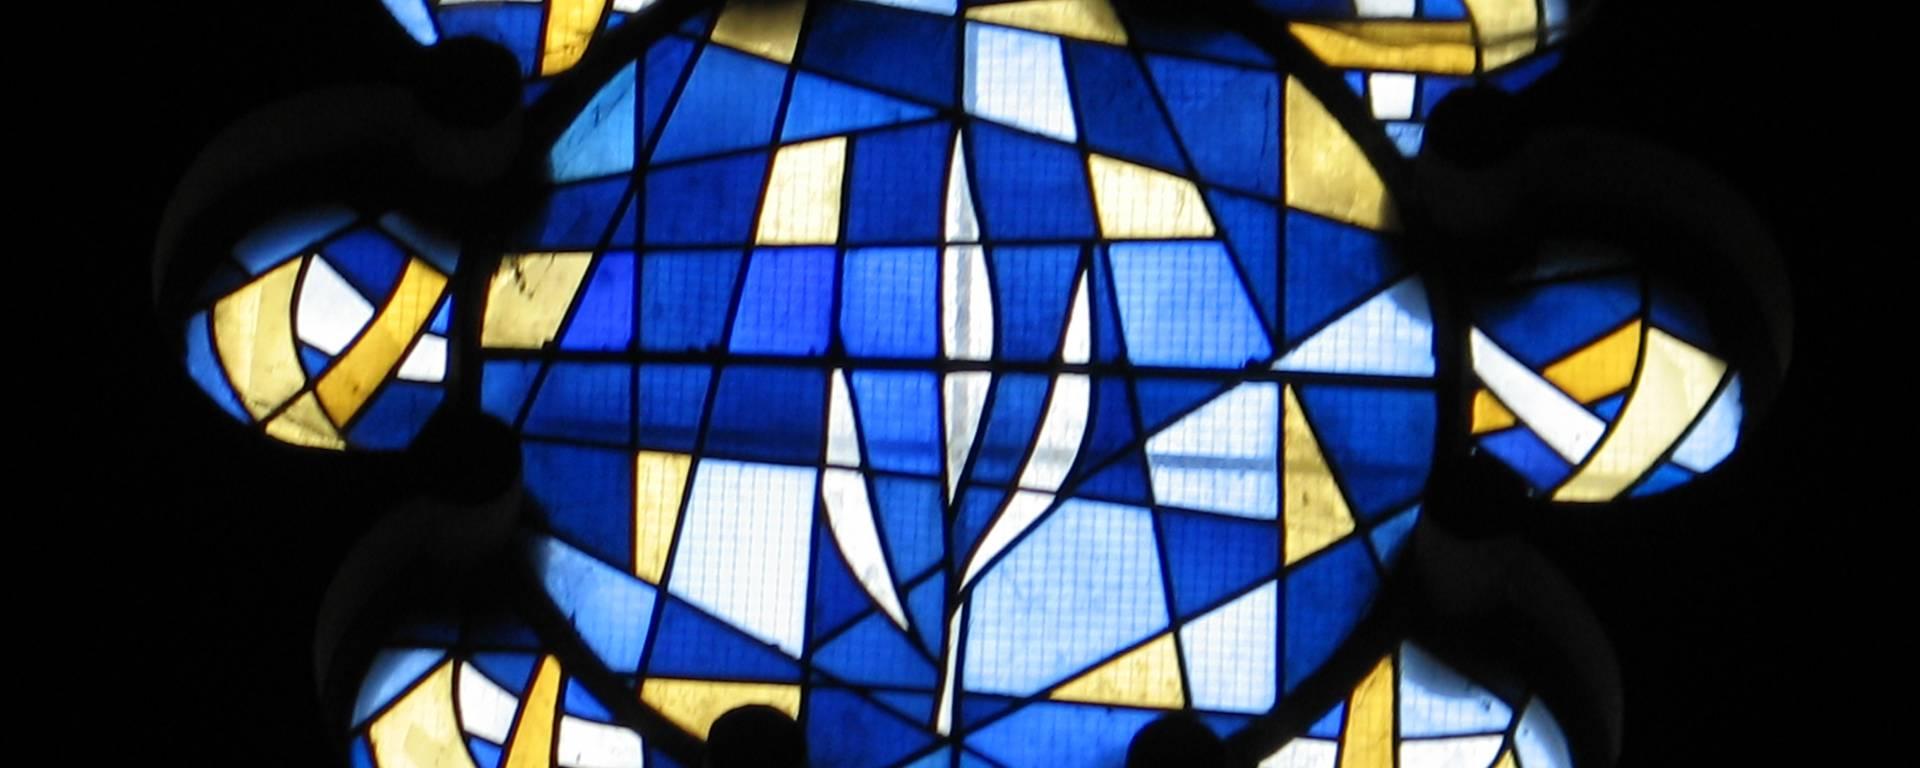 Vitrail-Eglise-Vieux-Saint-Ouen